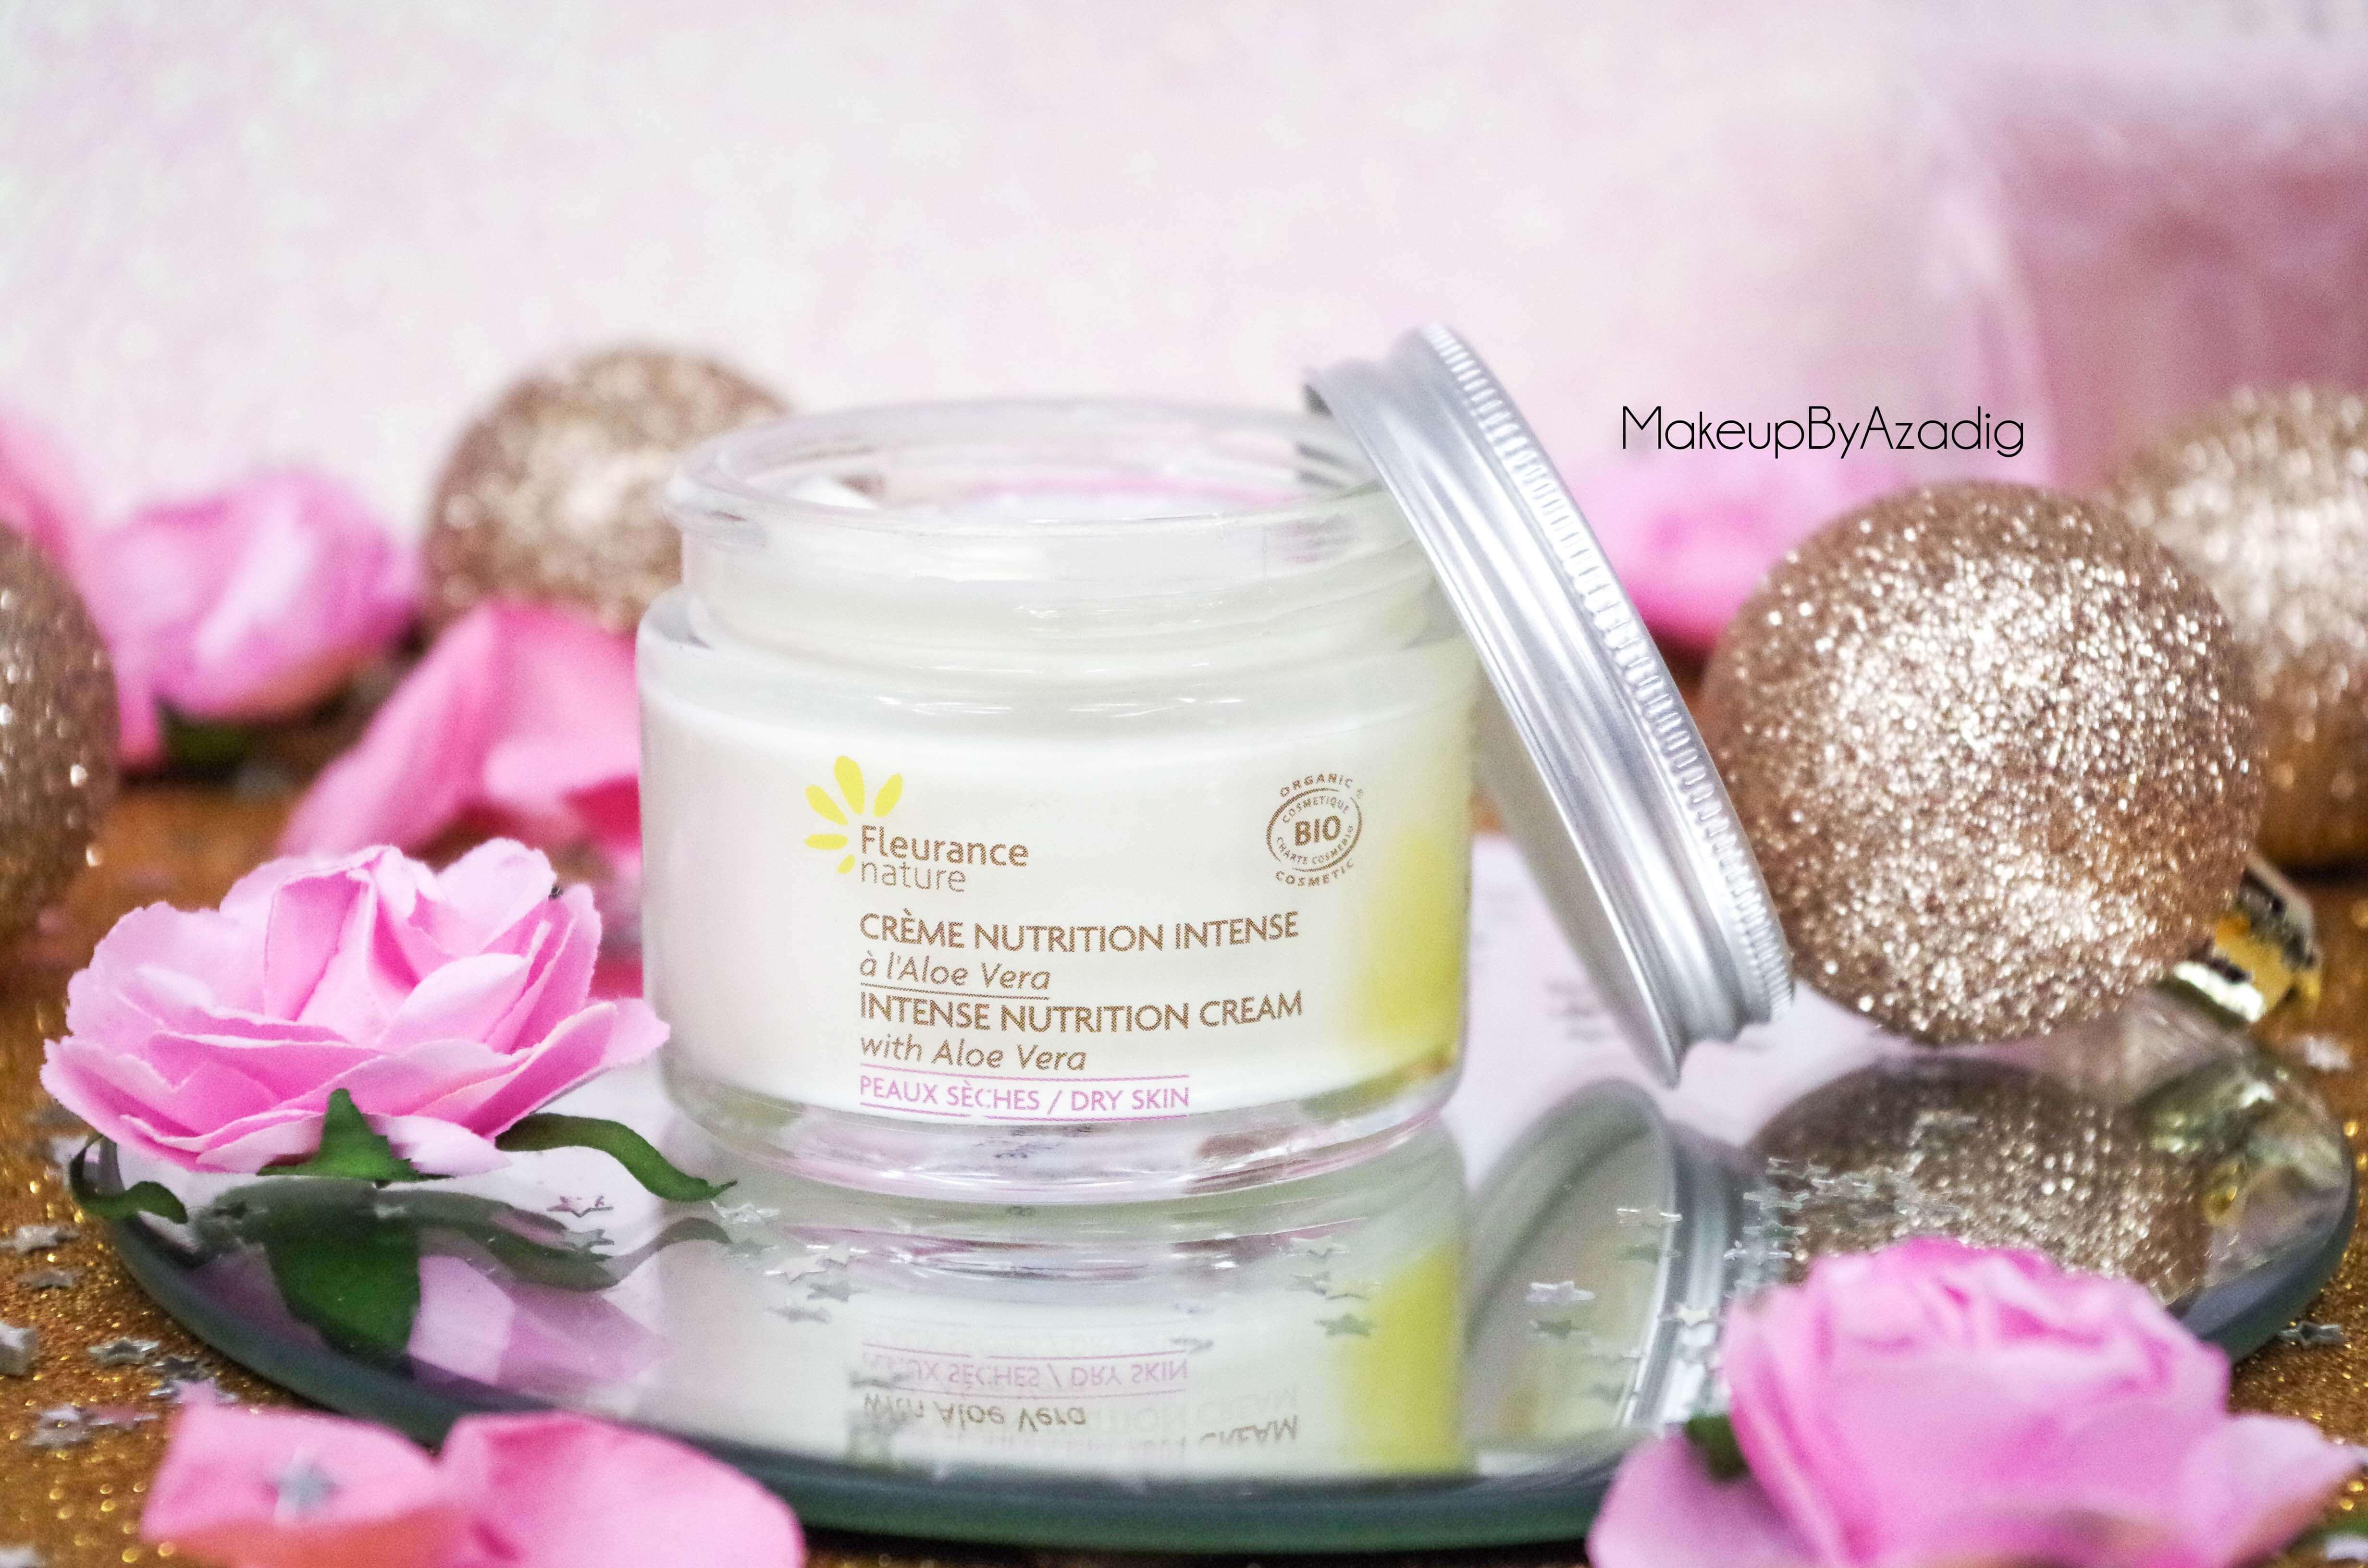 miniature-creme-nutrition-intense-serum-nuit-fleur-immortelle-fleurance-nature-makeupbyazadig-revue-prix-avis